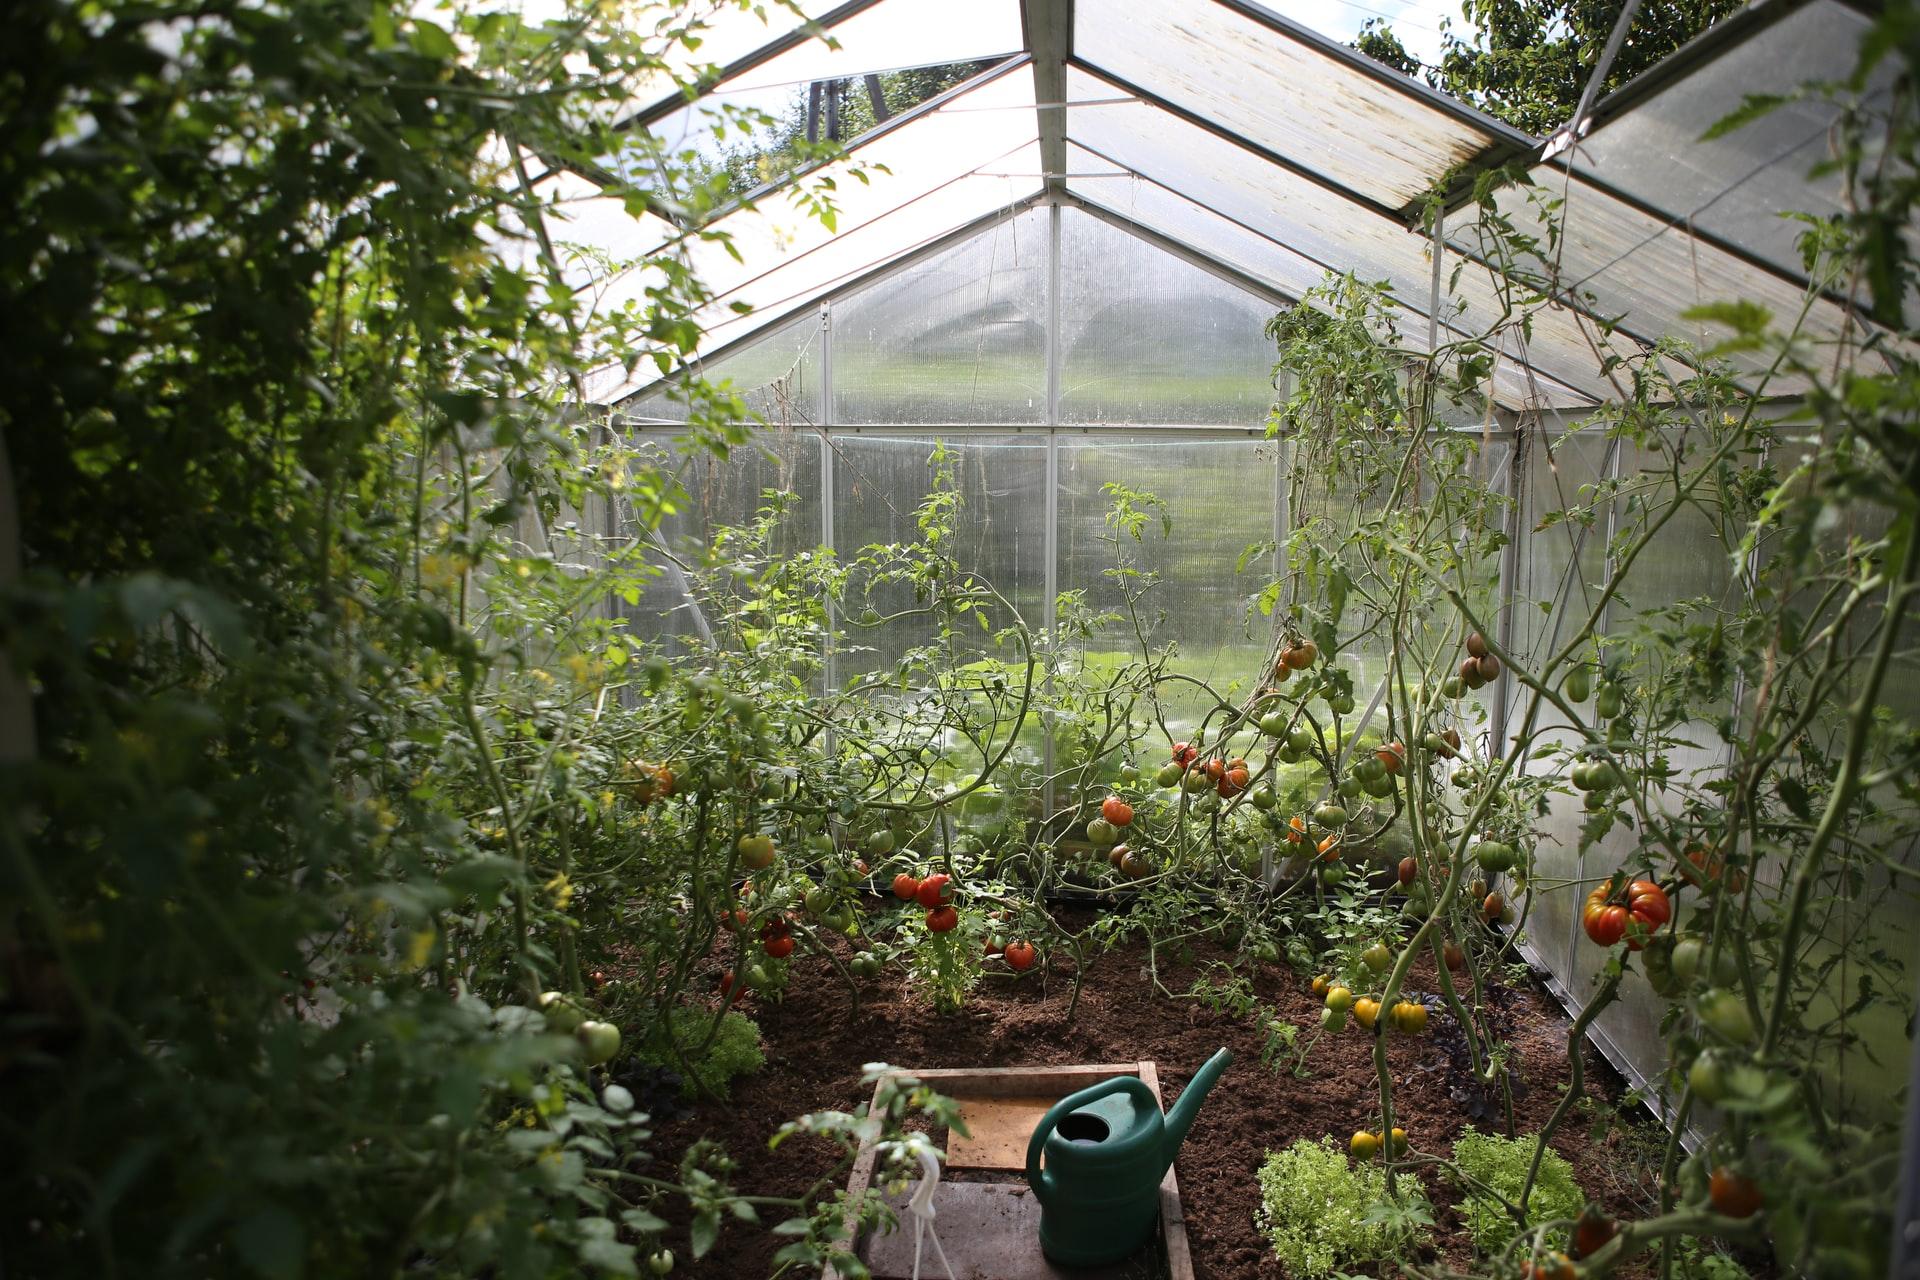 Greenhouse with tomato vines